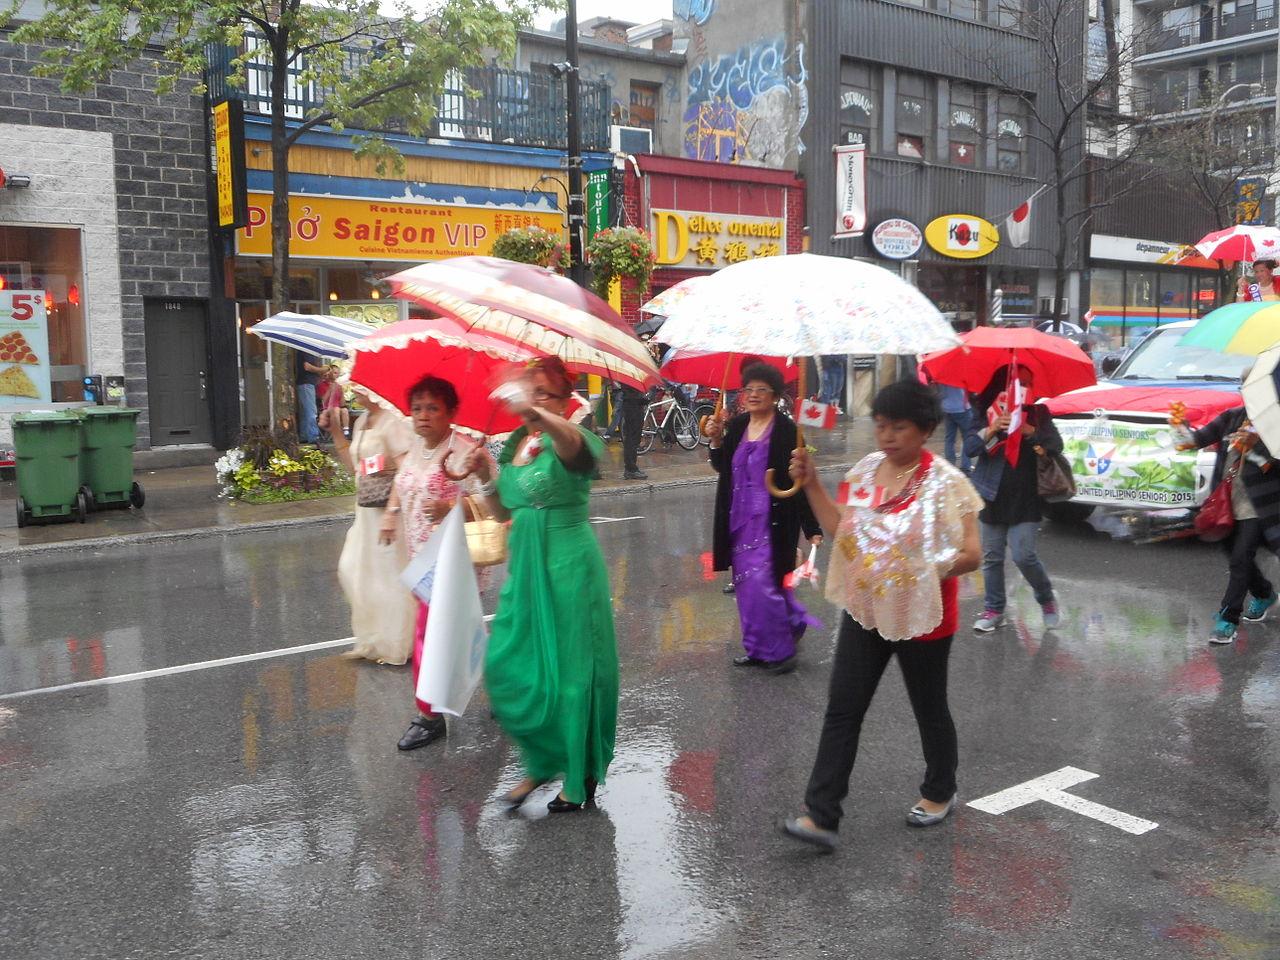 File:Canada Day 2015 on Saint Catherine Street - 271.jpg - Wikimedia